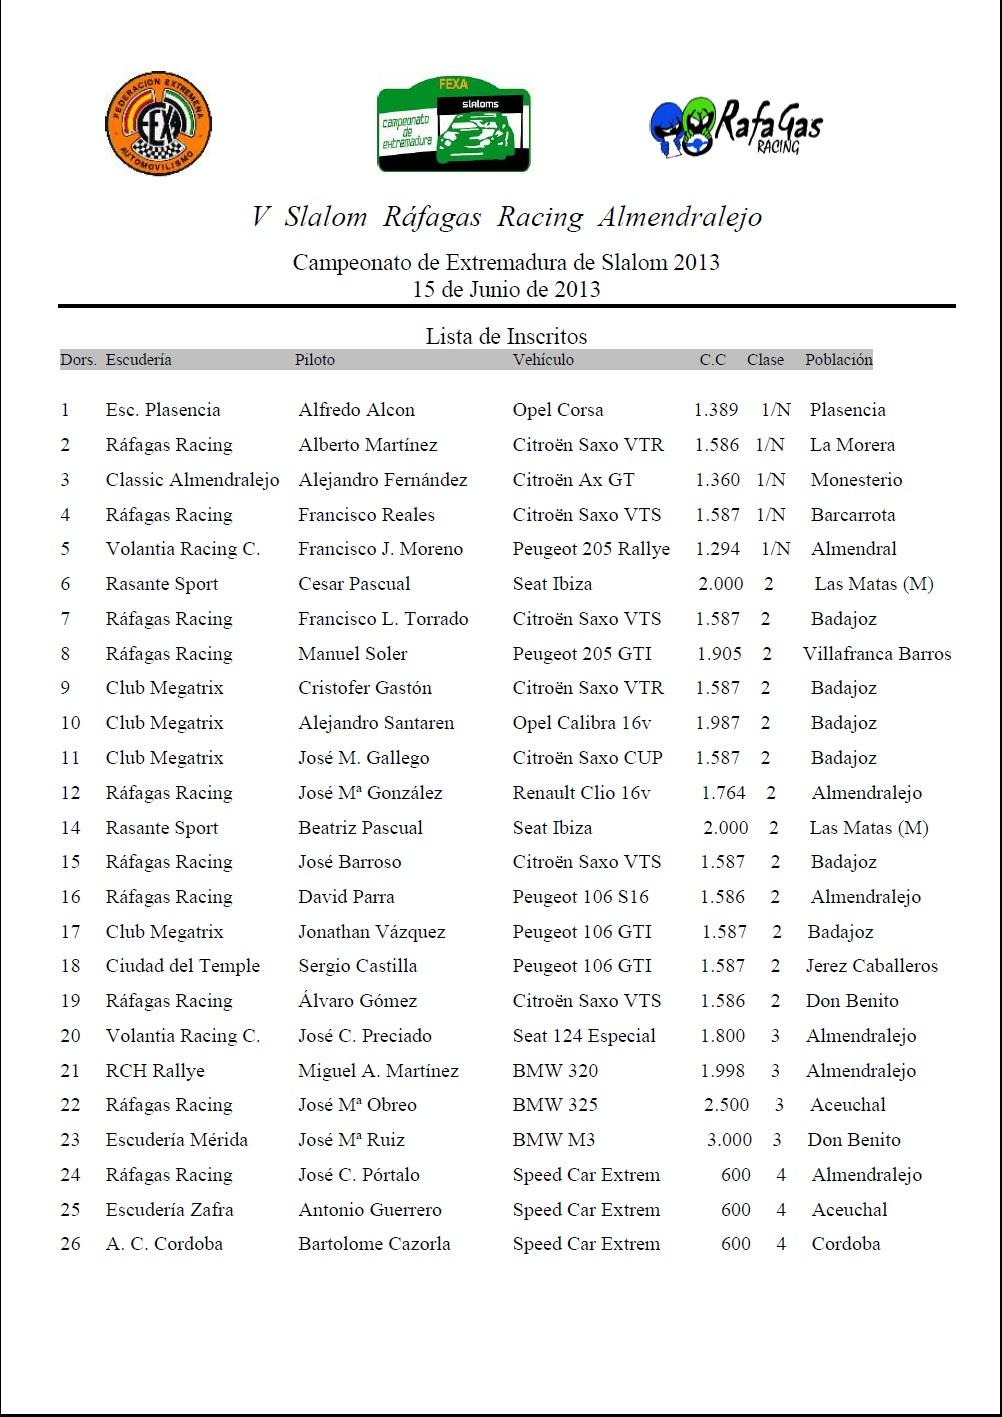 V Slalom Rafagas Racing - Almendralejo 8489816lista-de-inscritos-v